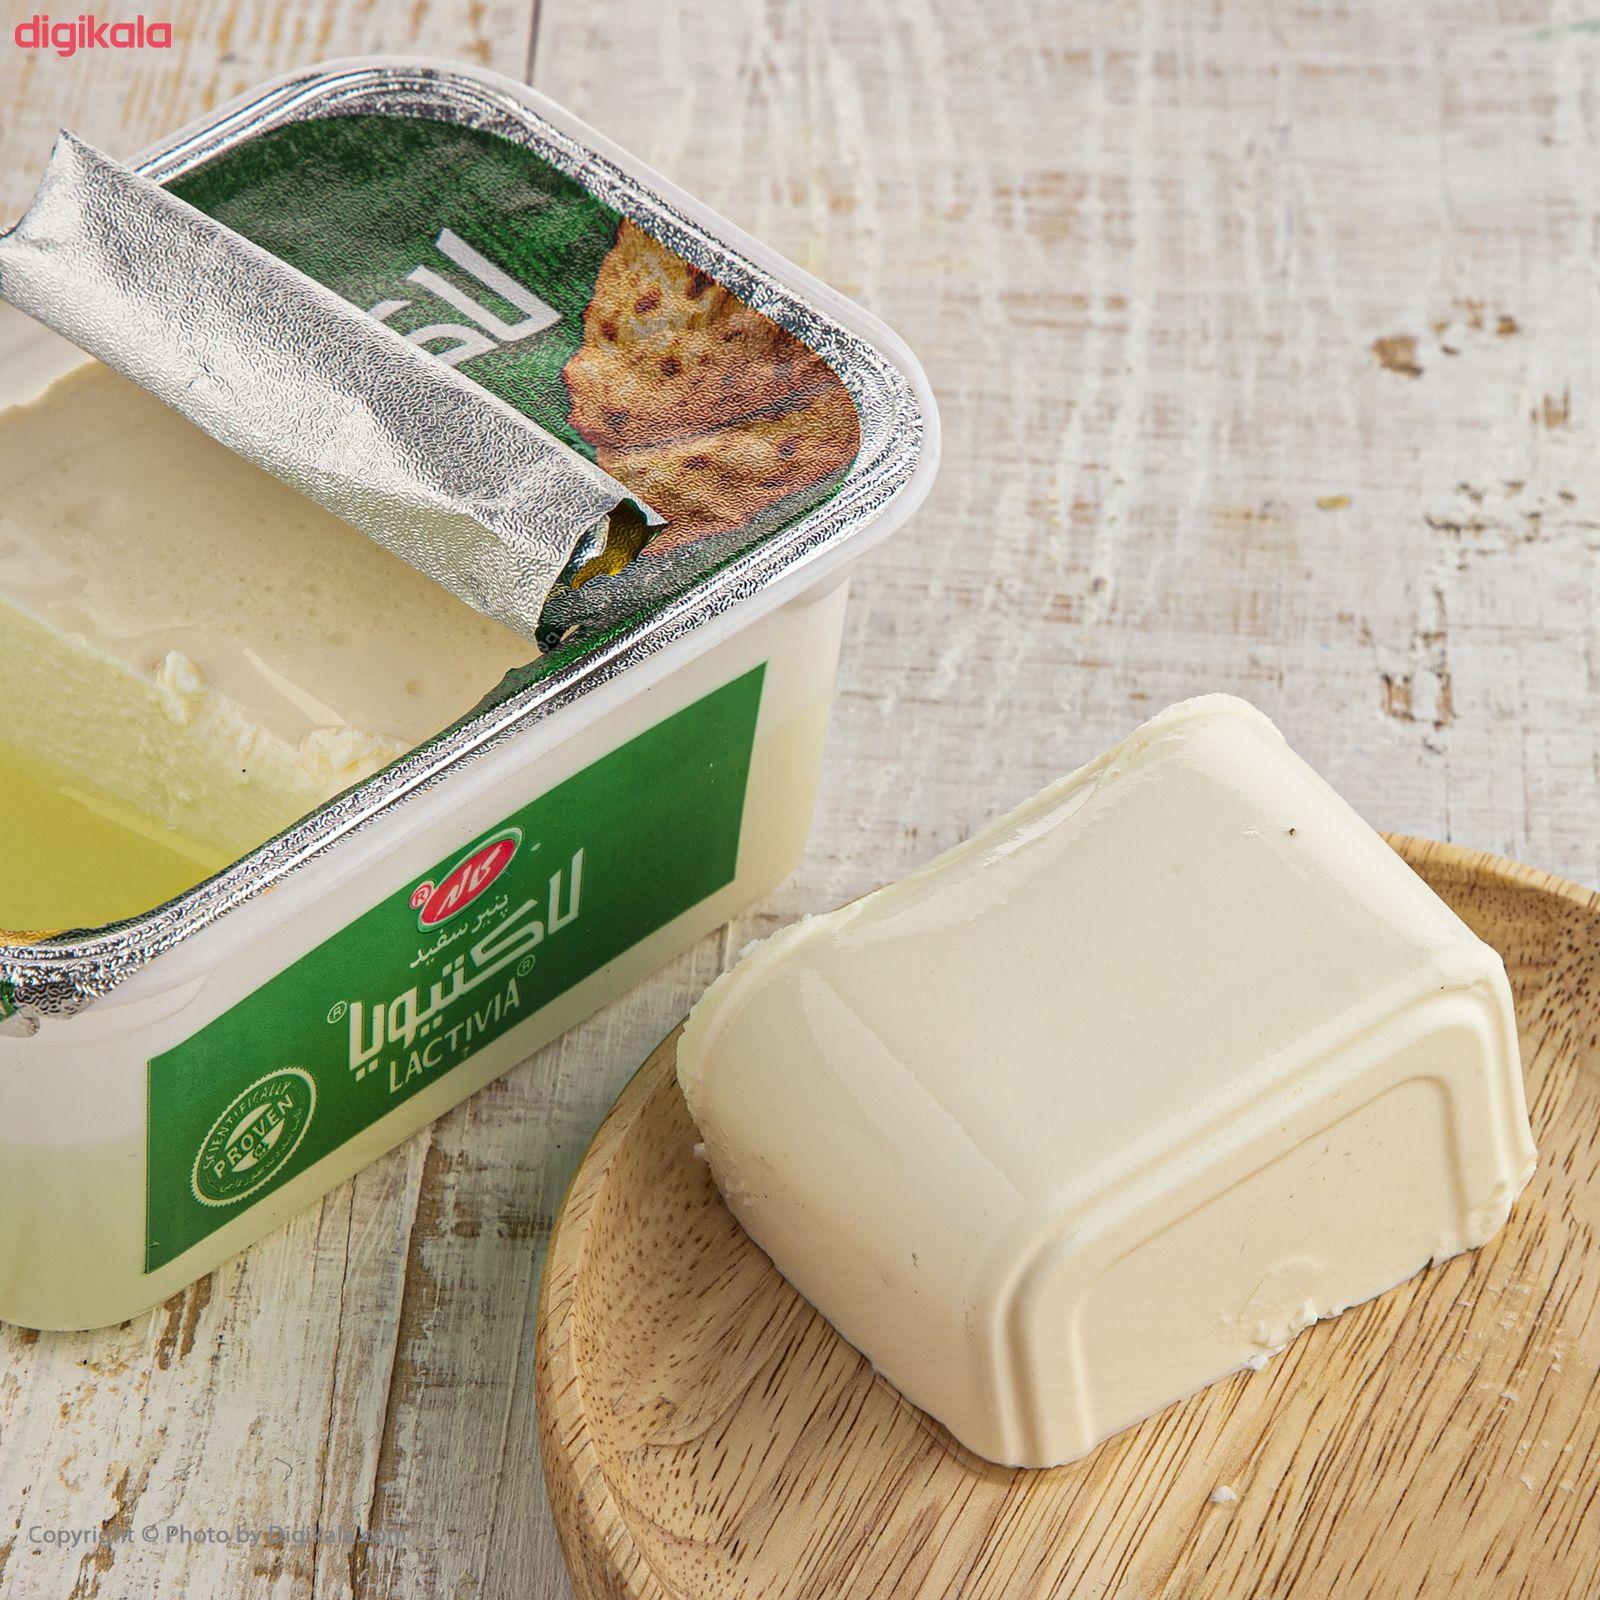 پنیر سفید لاکتیویا کاله مقدار 400 گرم main 1 7